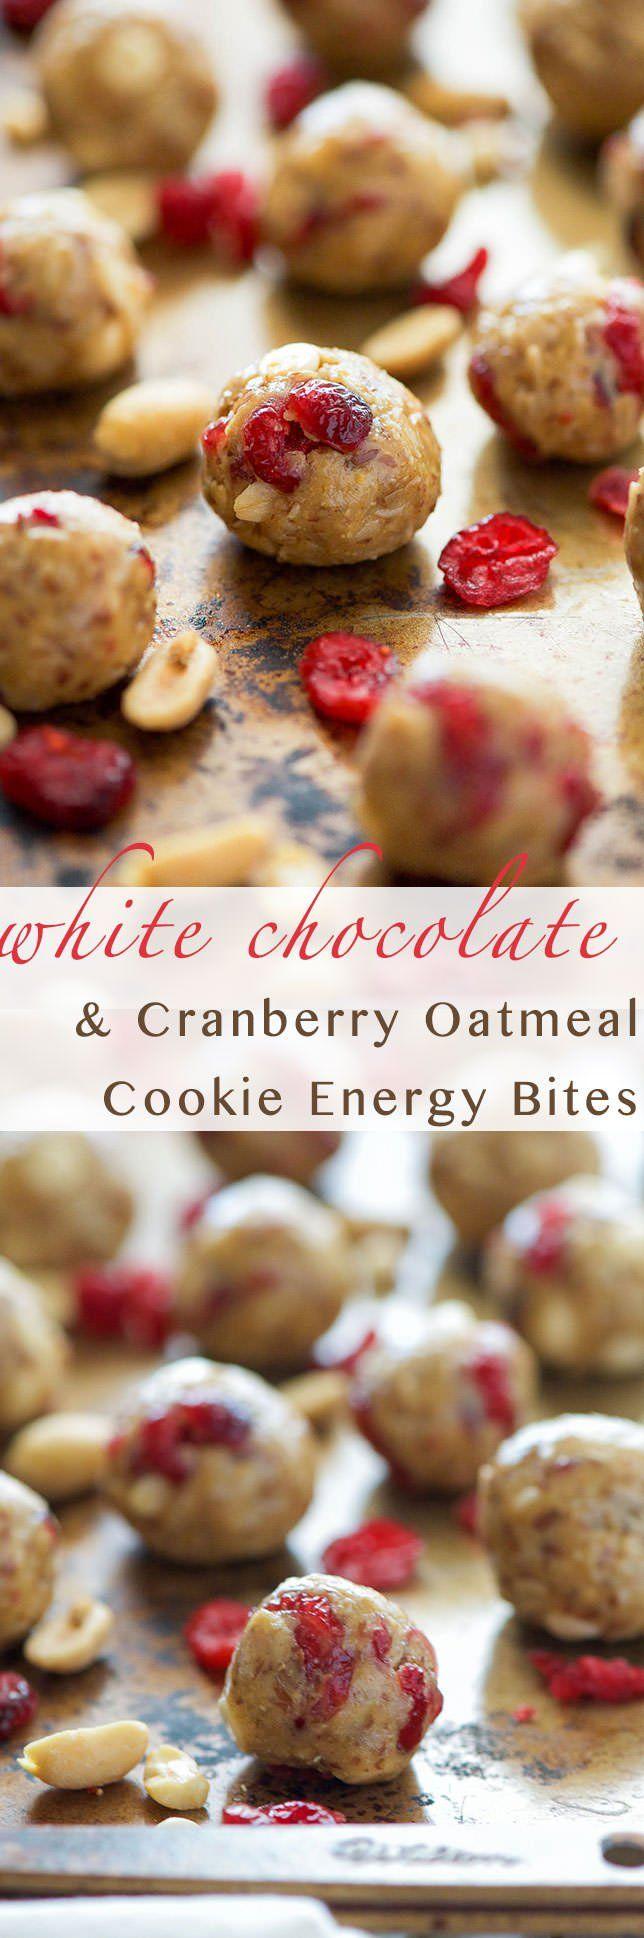 1000+ ideas about Oatmeal Energy Bites on Pinterest | Energy Bites, No ...